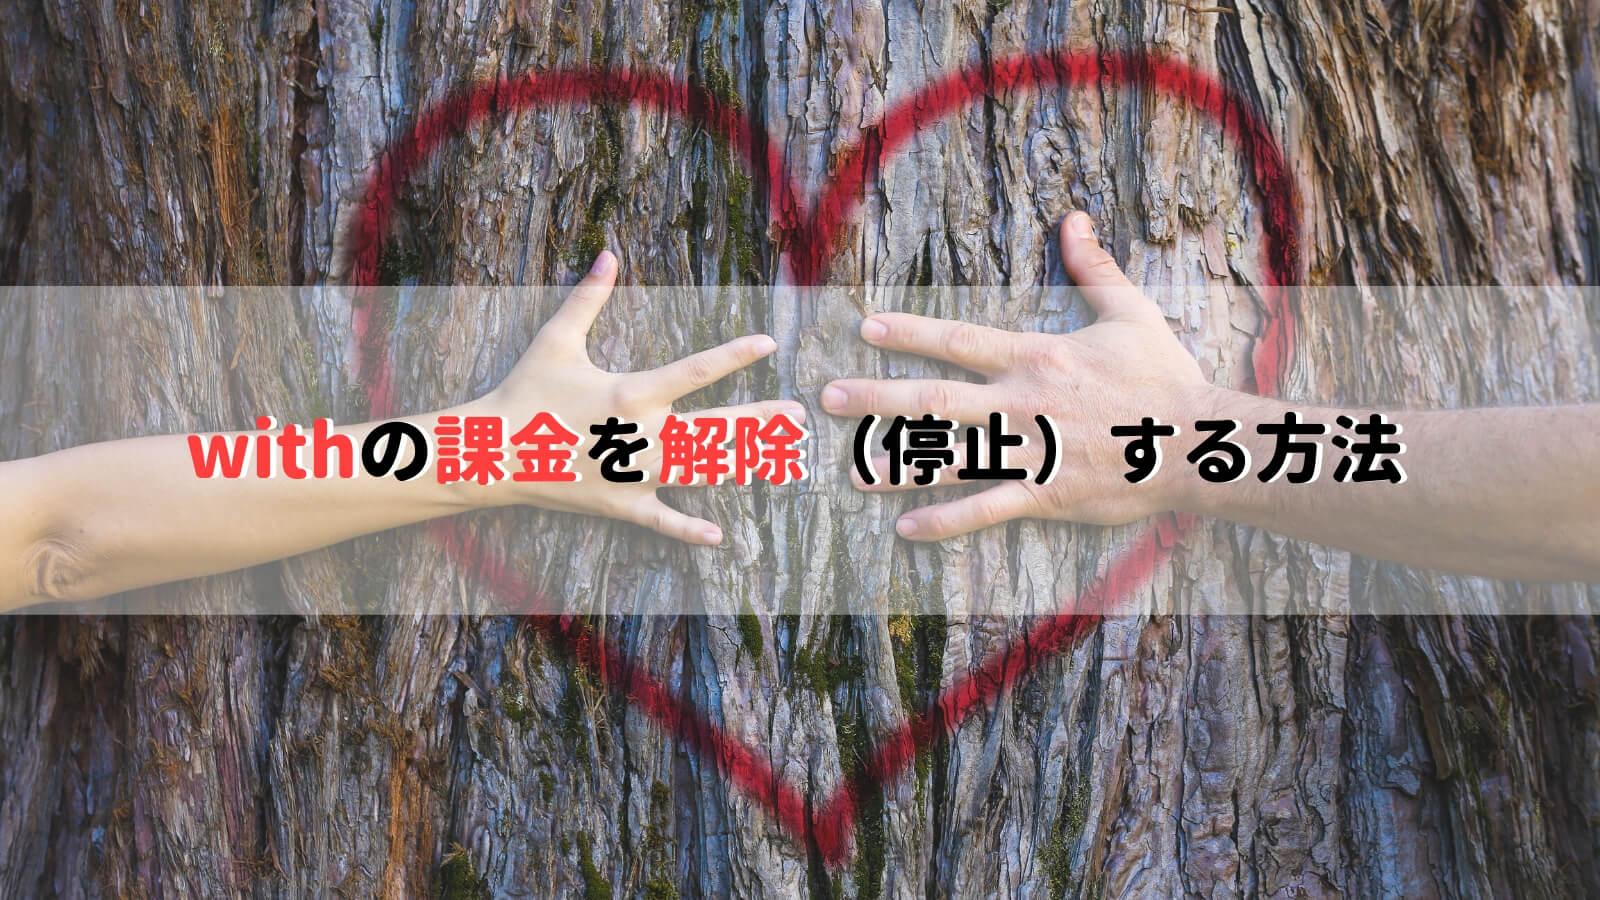 withの課金を解除(停止)する方法